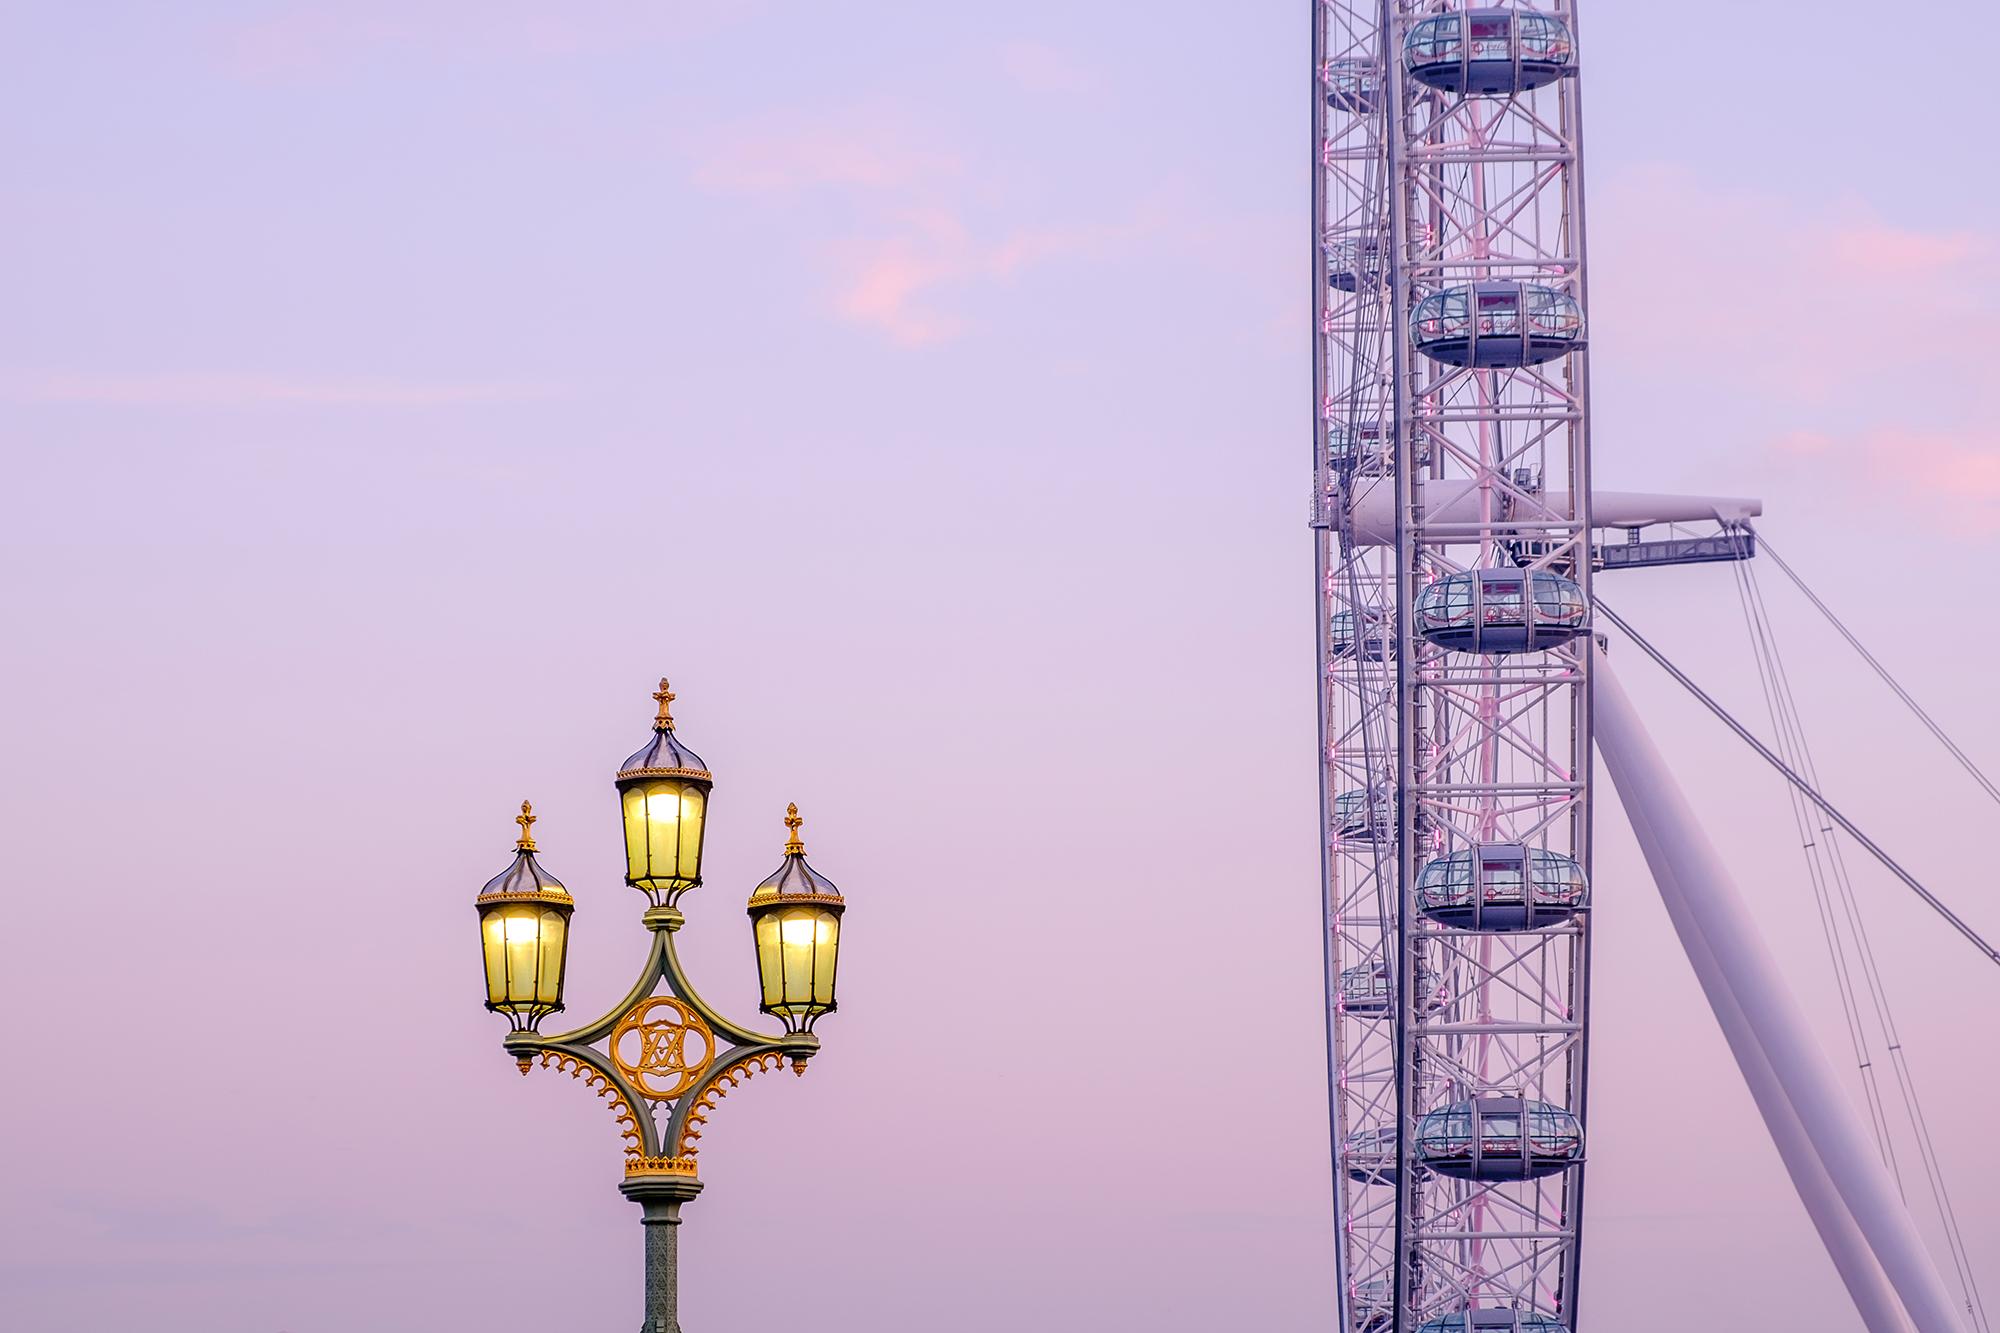 A photo of the London Eye taken at sunrise by Trevor Sherwin